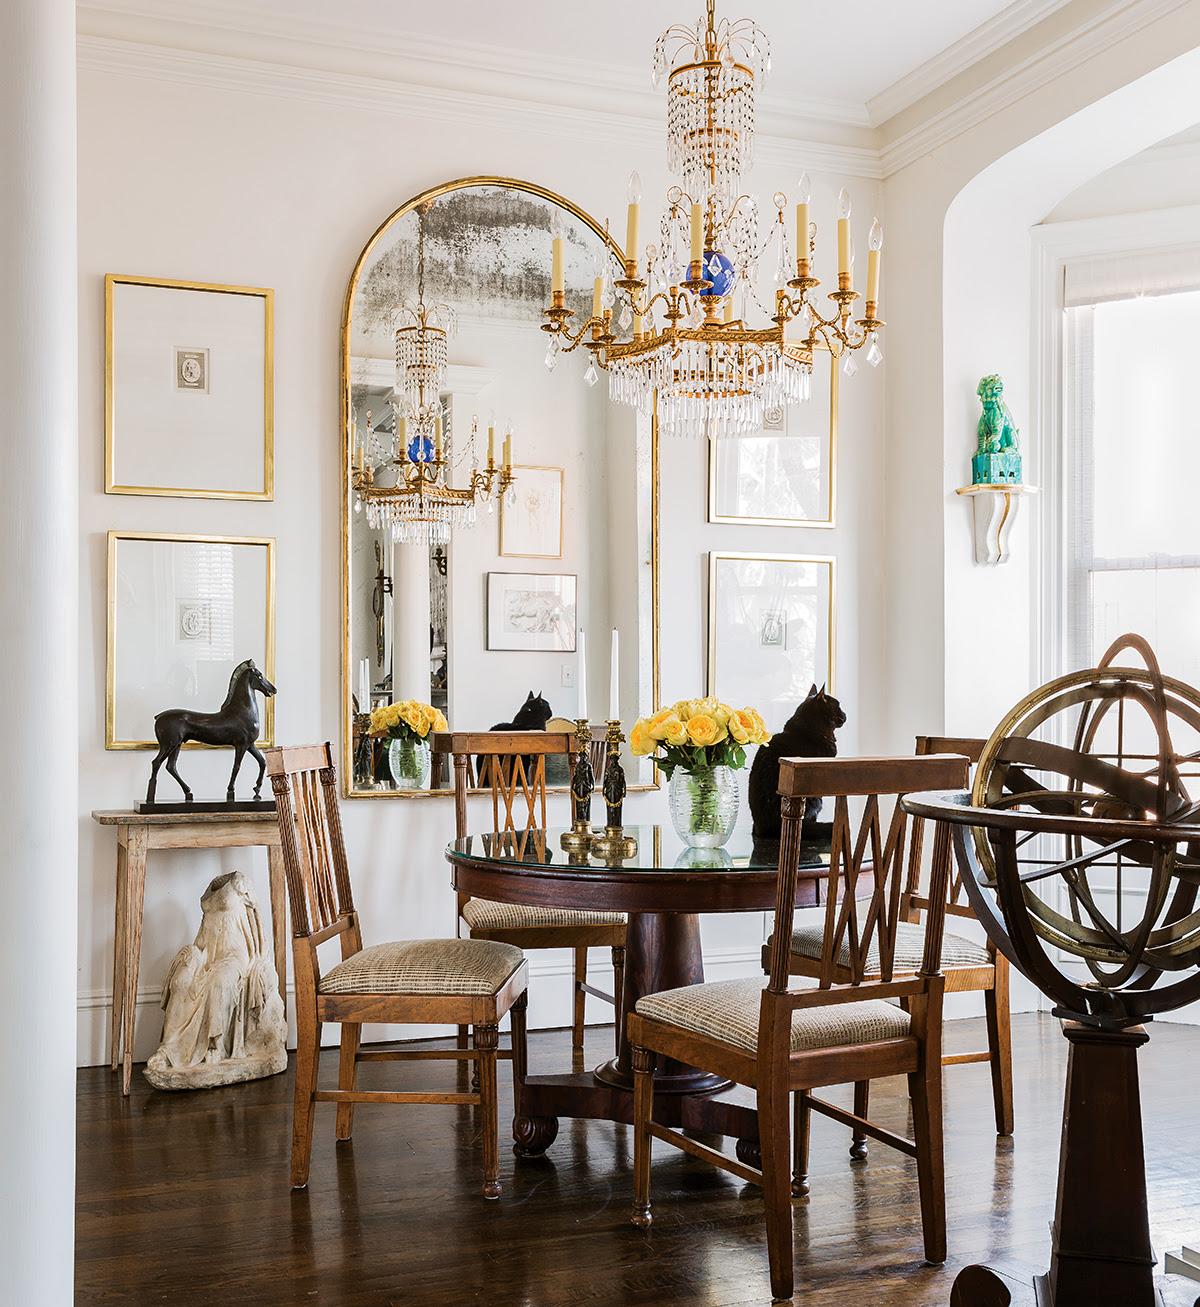 Top 10 Boston Interior Designers and Decorators   Décor Aid